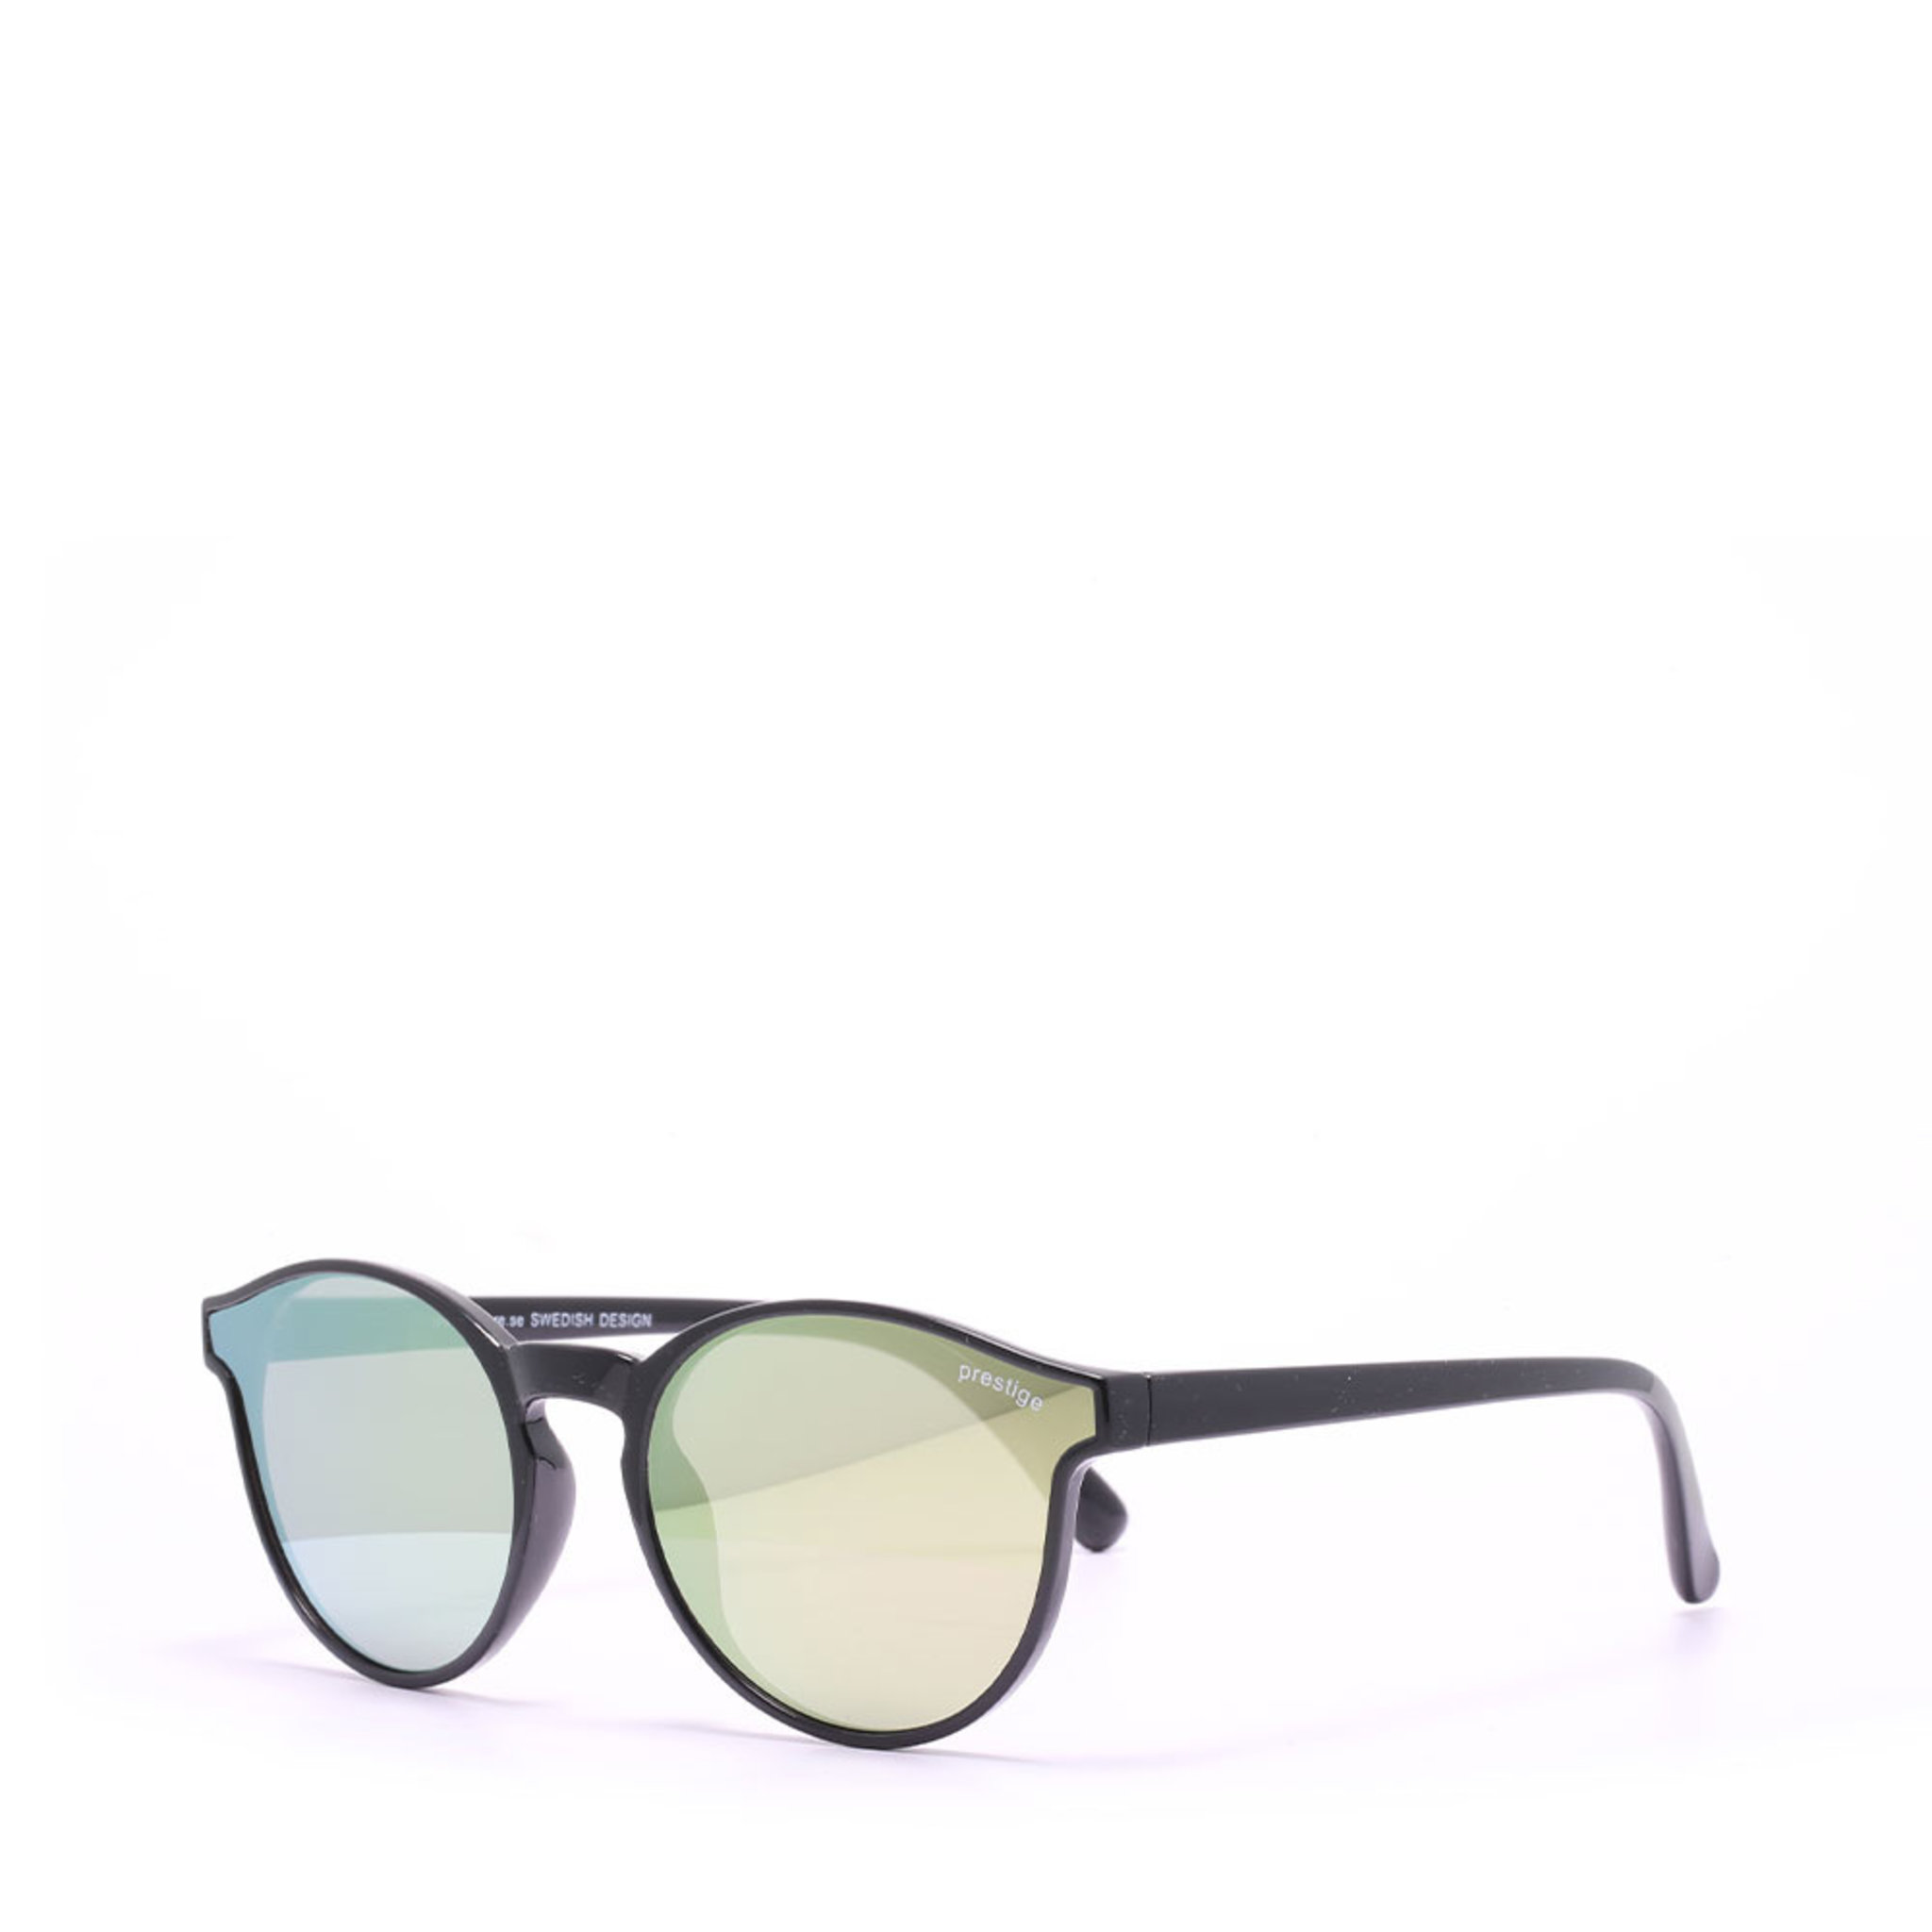 Lucky Black Sunglasses